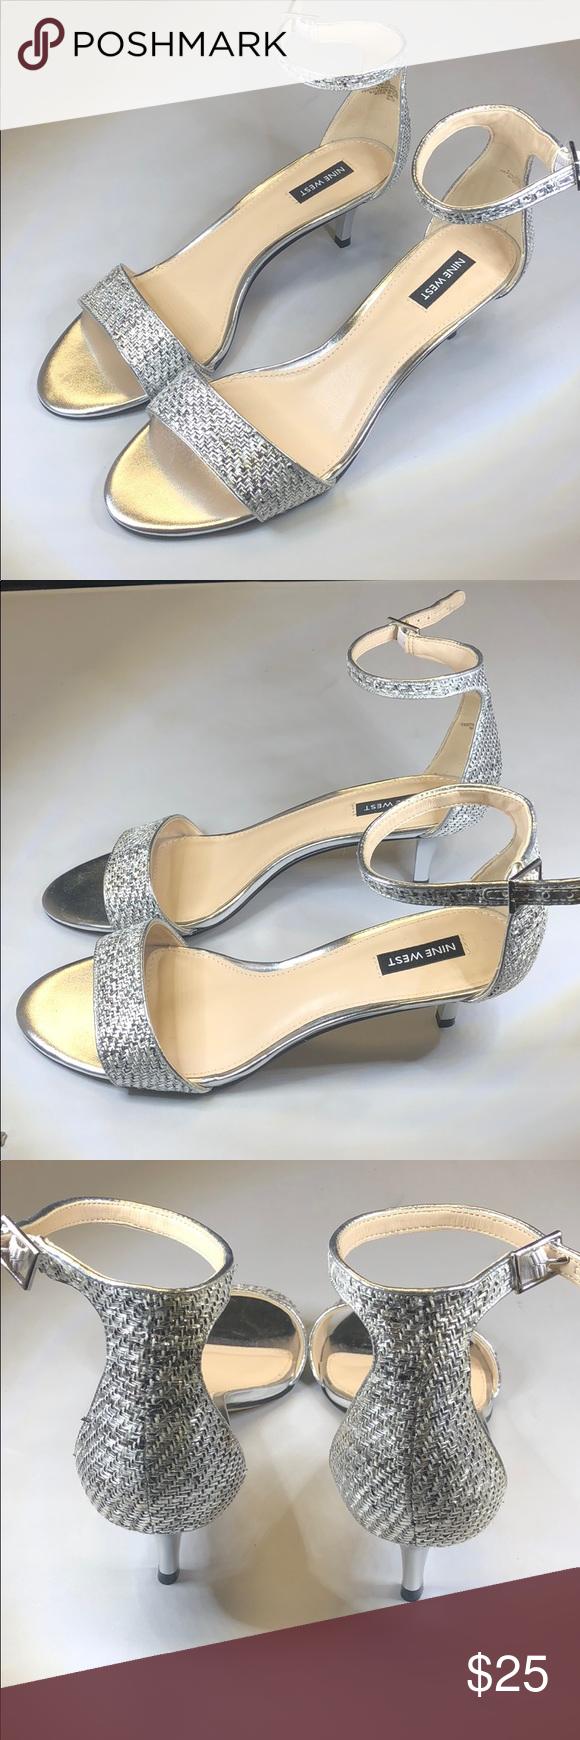 P254 Nine West Heel Sandals Silver Silver 8 5m Sandals Heels Nine West Heels Kitten Heel Sandals